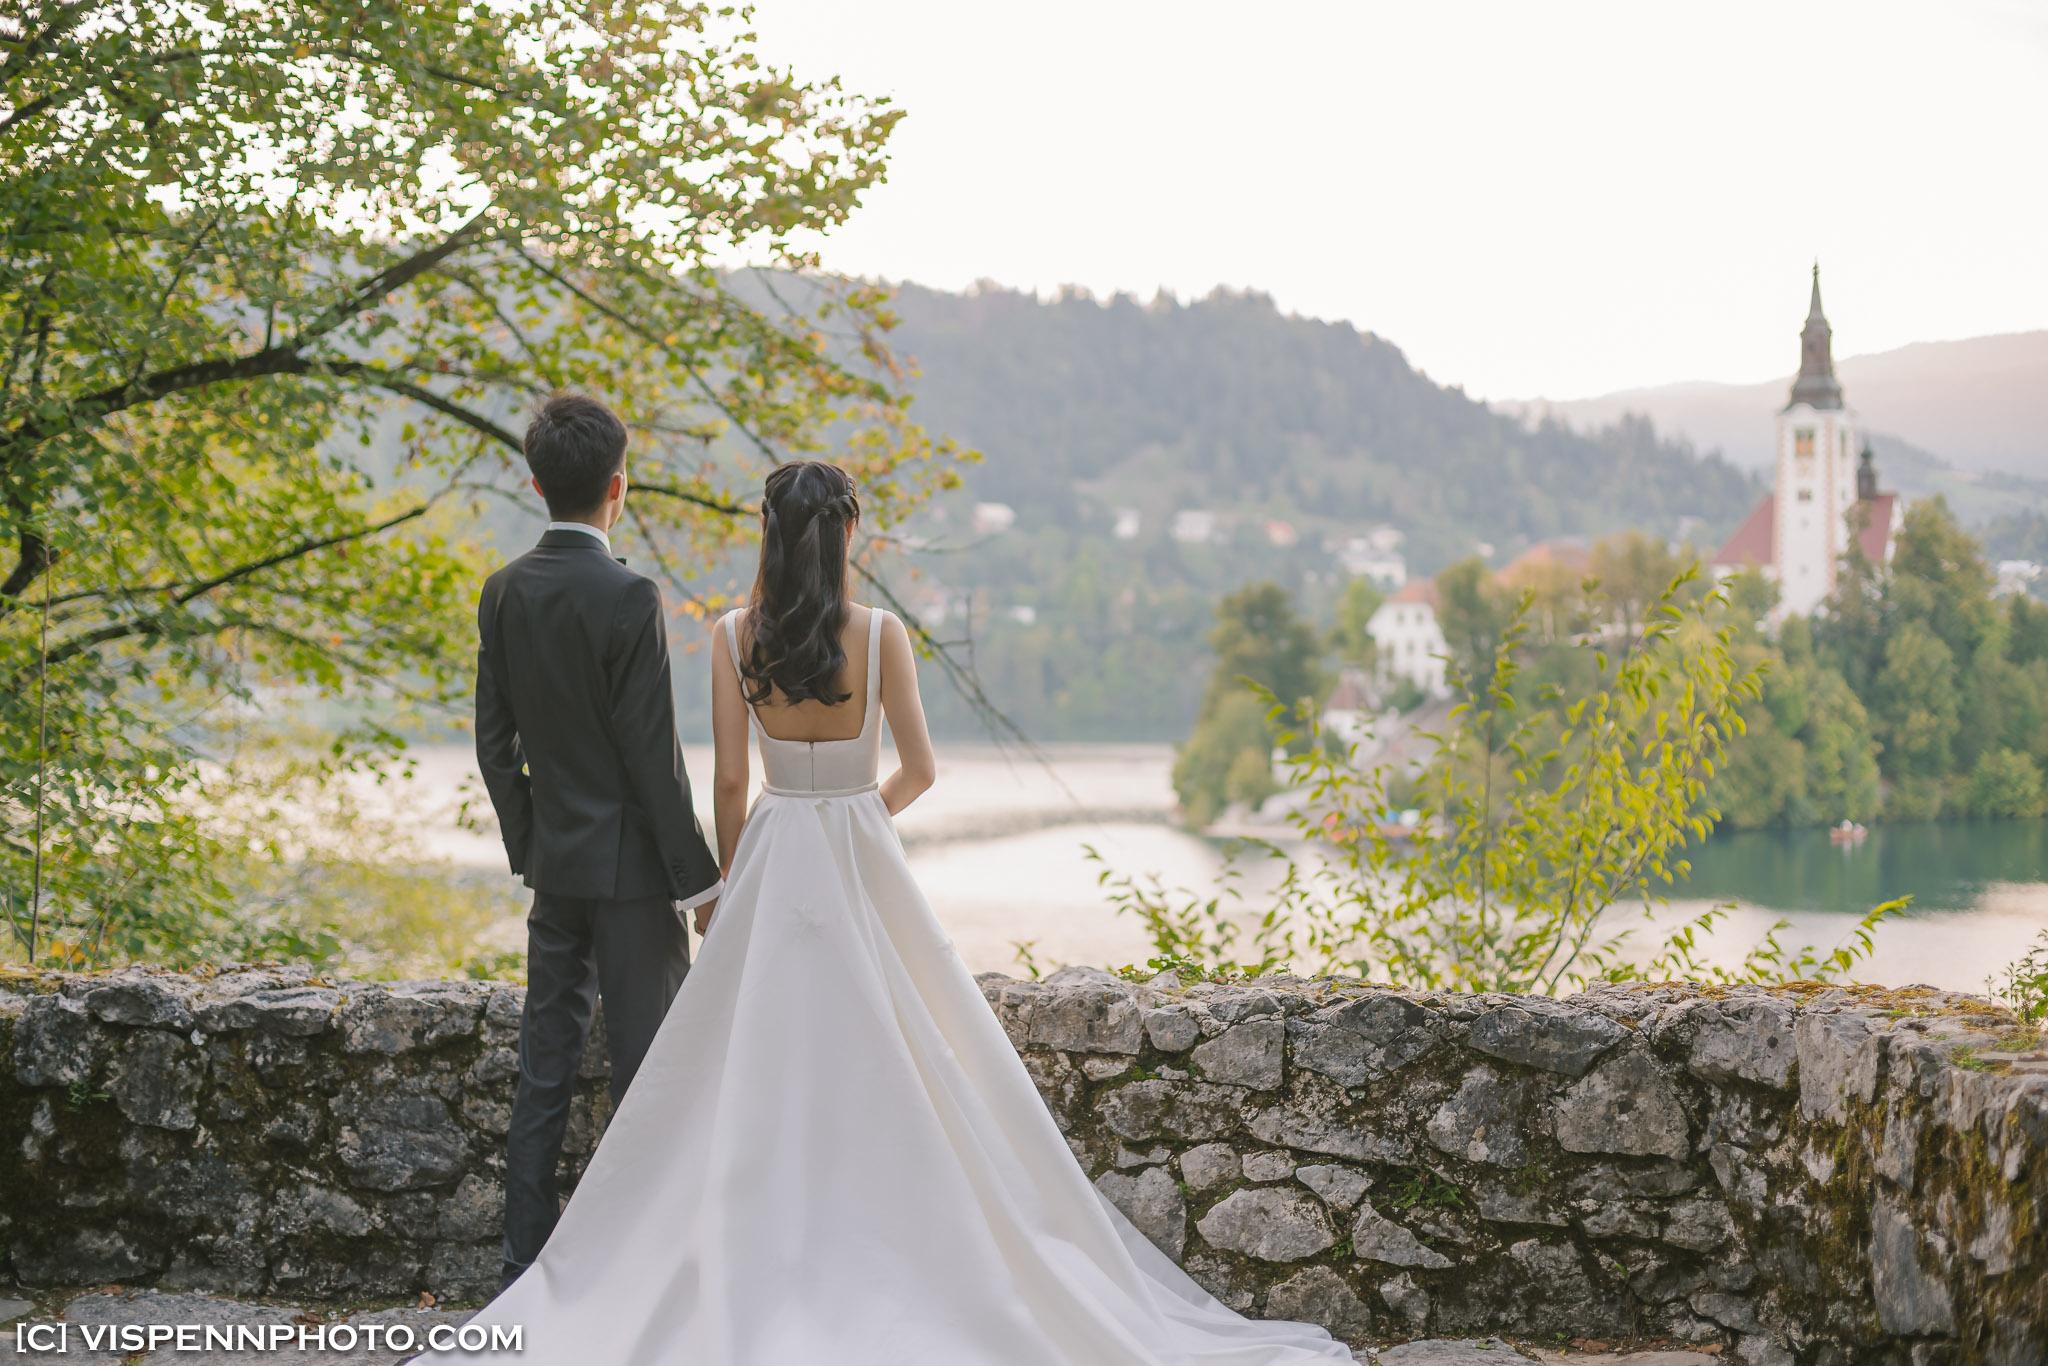 PRE WEDDING Photography Melbourne VISPENN 墨尔本 婚纱照 结婚照 婚纱摄影 DSC02879